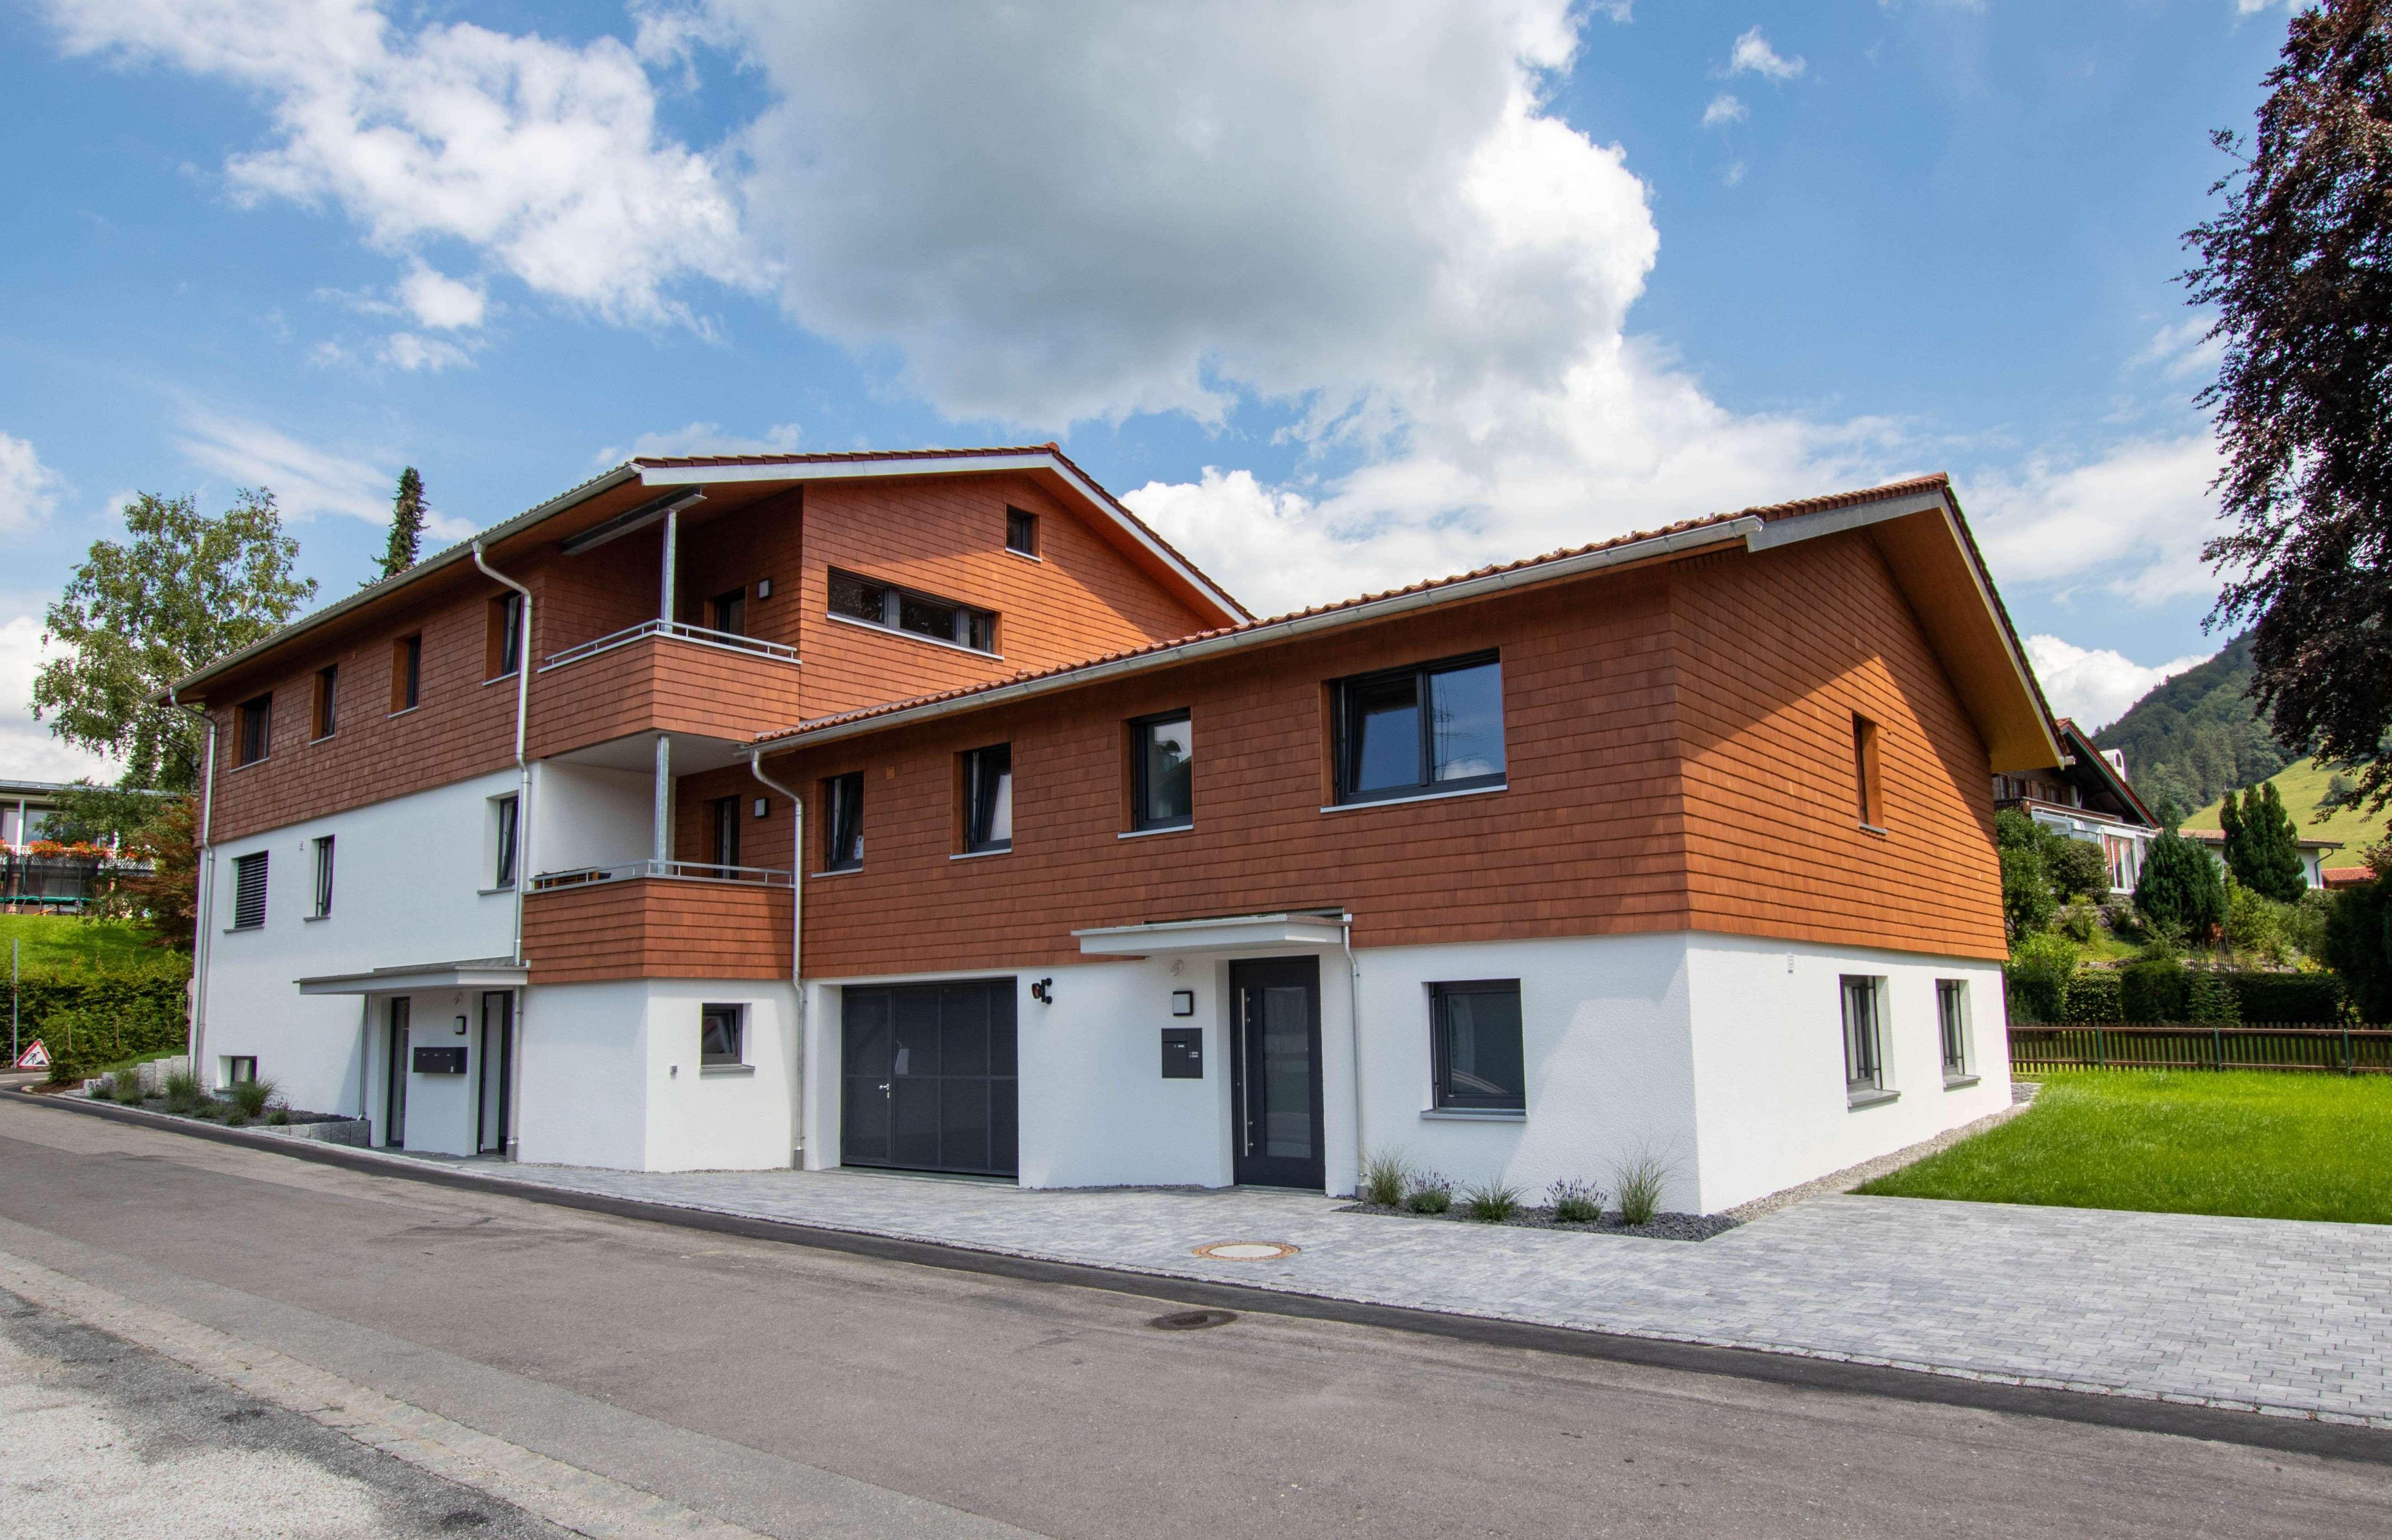 Großzügige Neubau-Wohnung ab sofort verfügbar! in